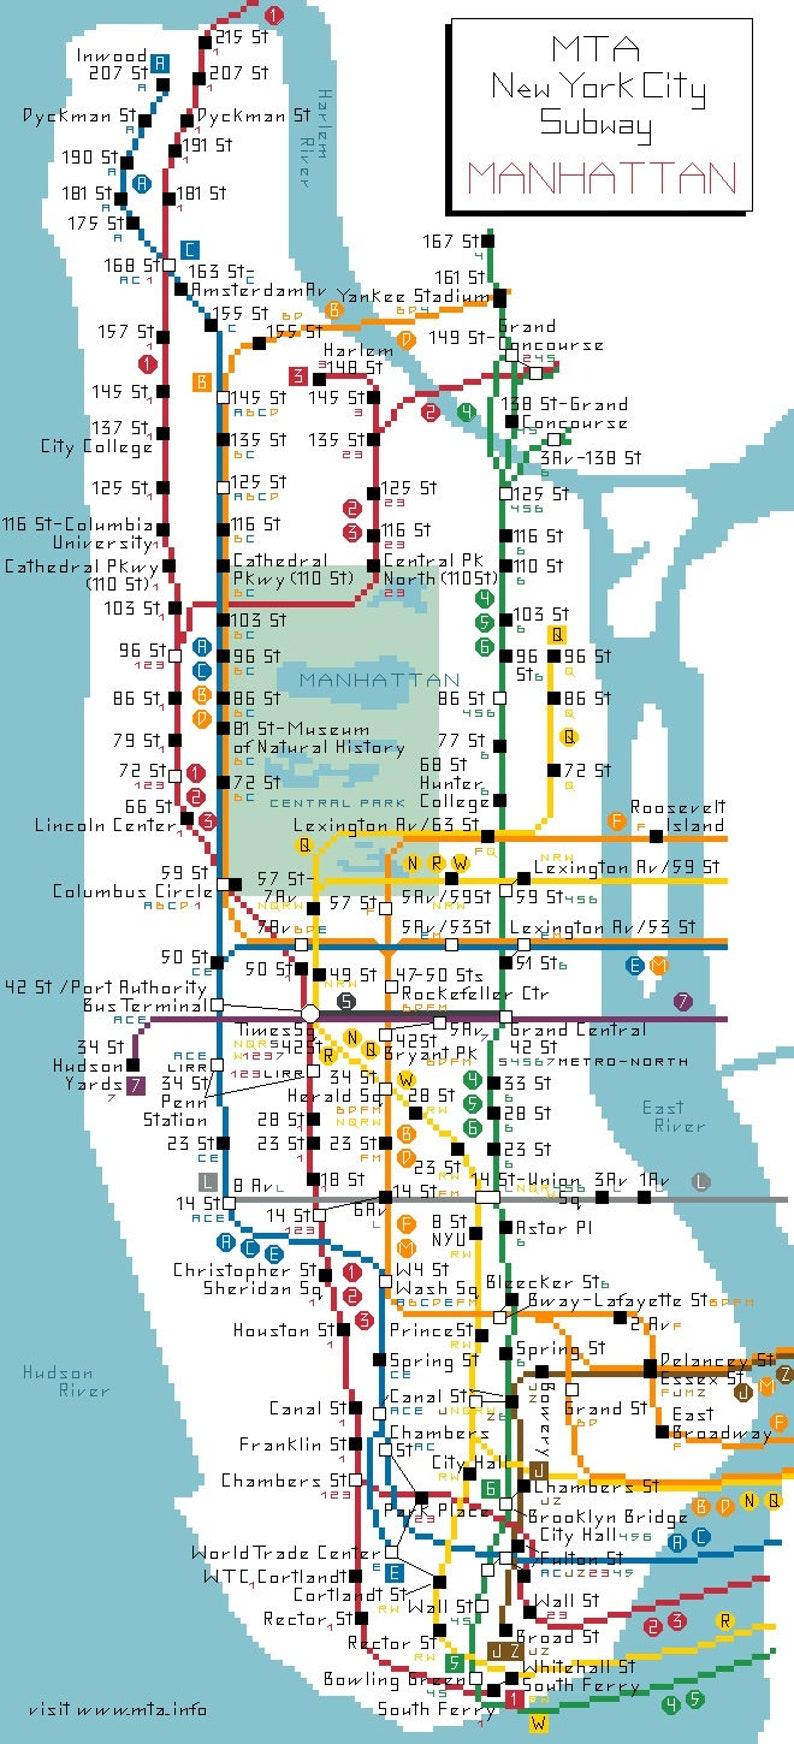 Nyc Subway Map 2018 Pdf.Manhattan Subway Cross Stitch Pattern Pdf Download New York City Map Counted Design